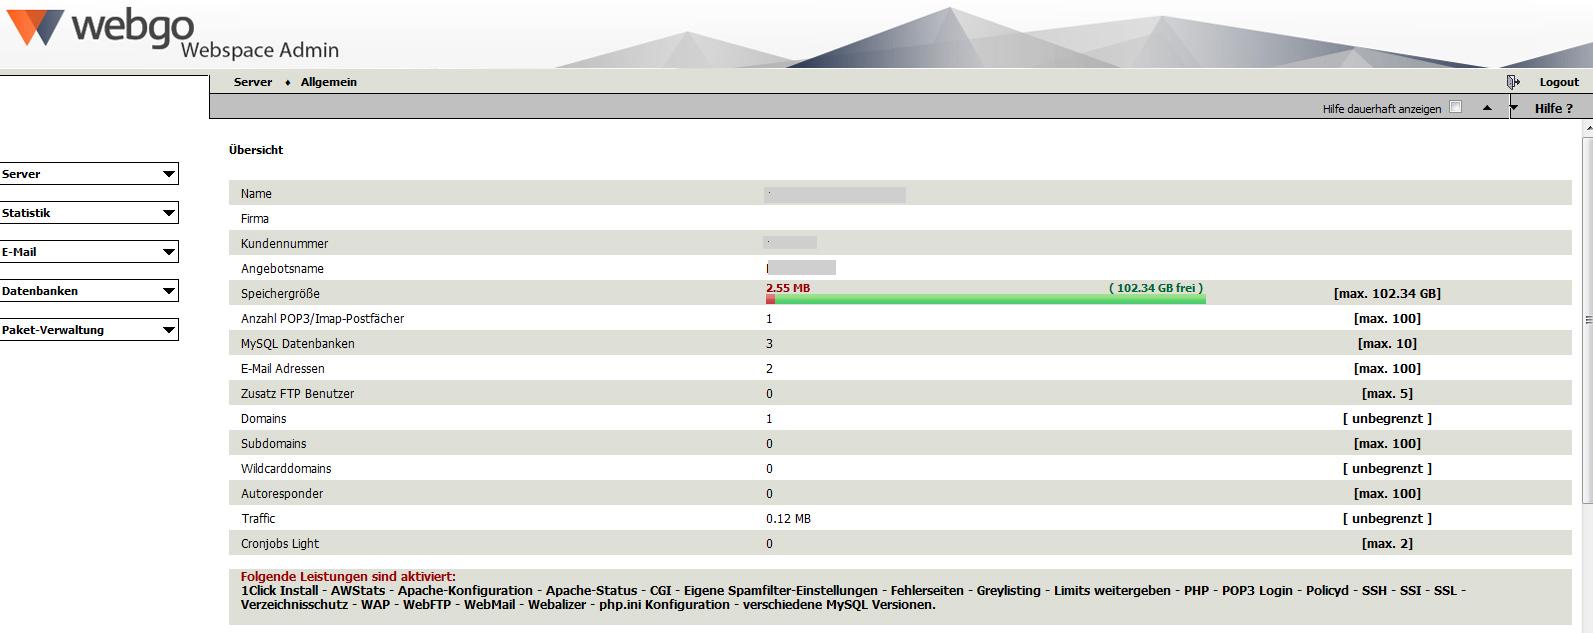 webgo Webspace Admin